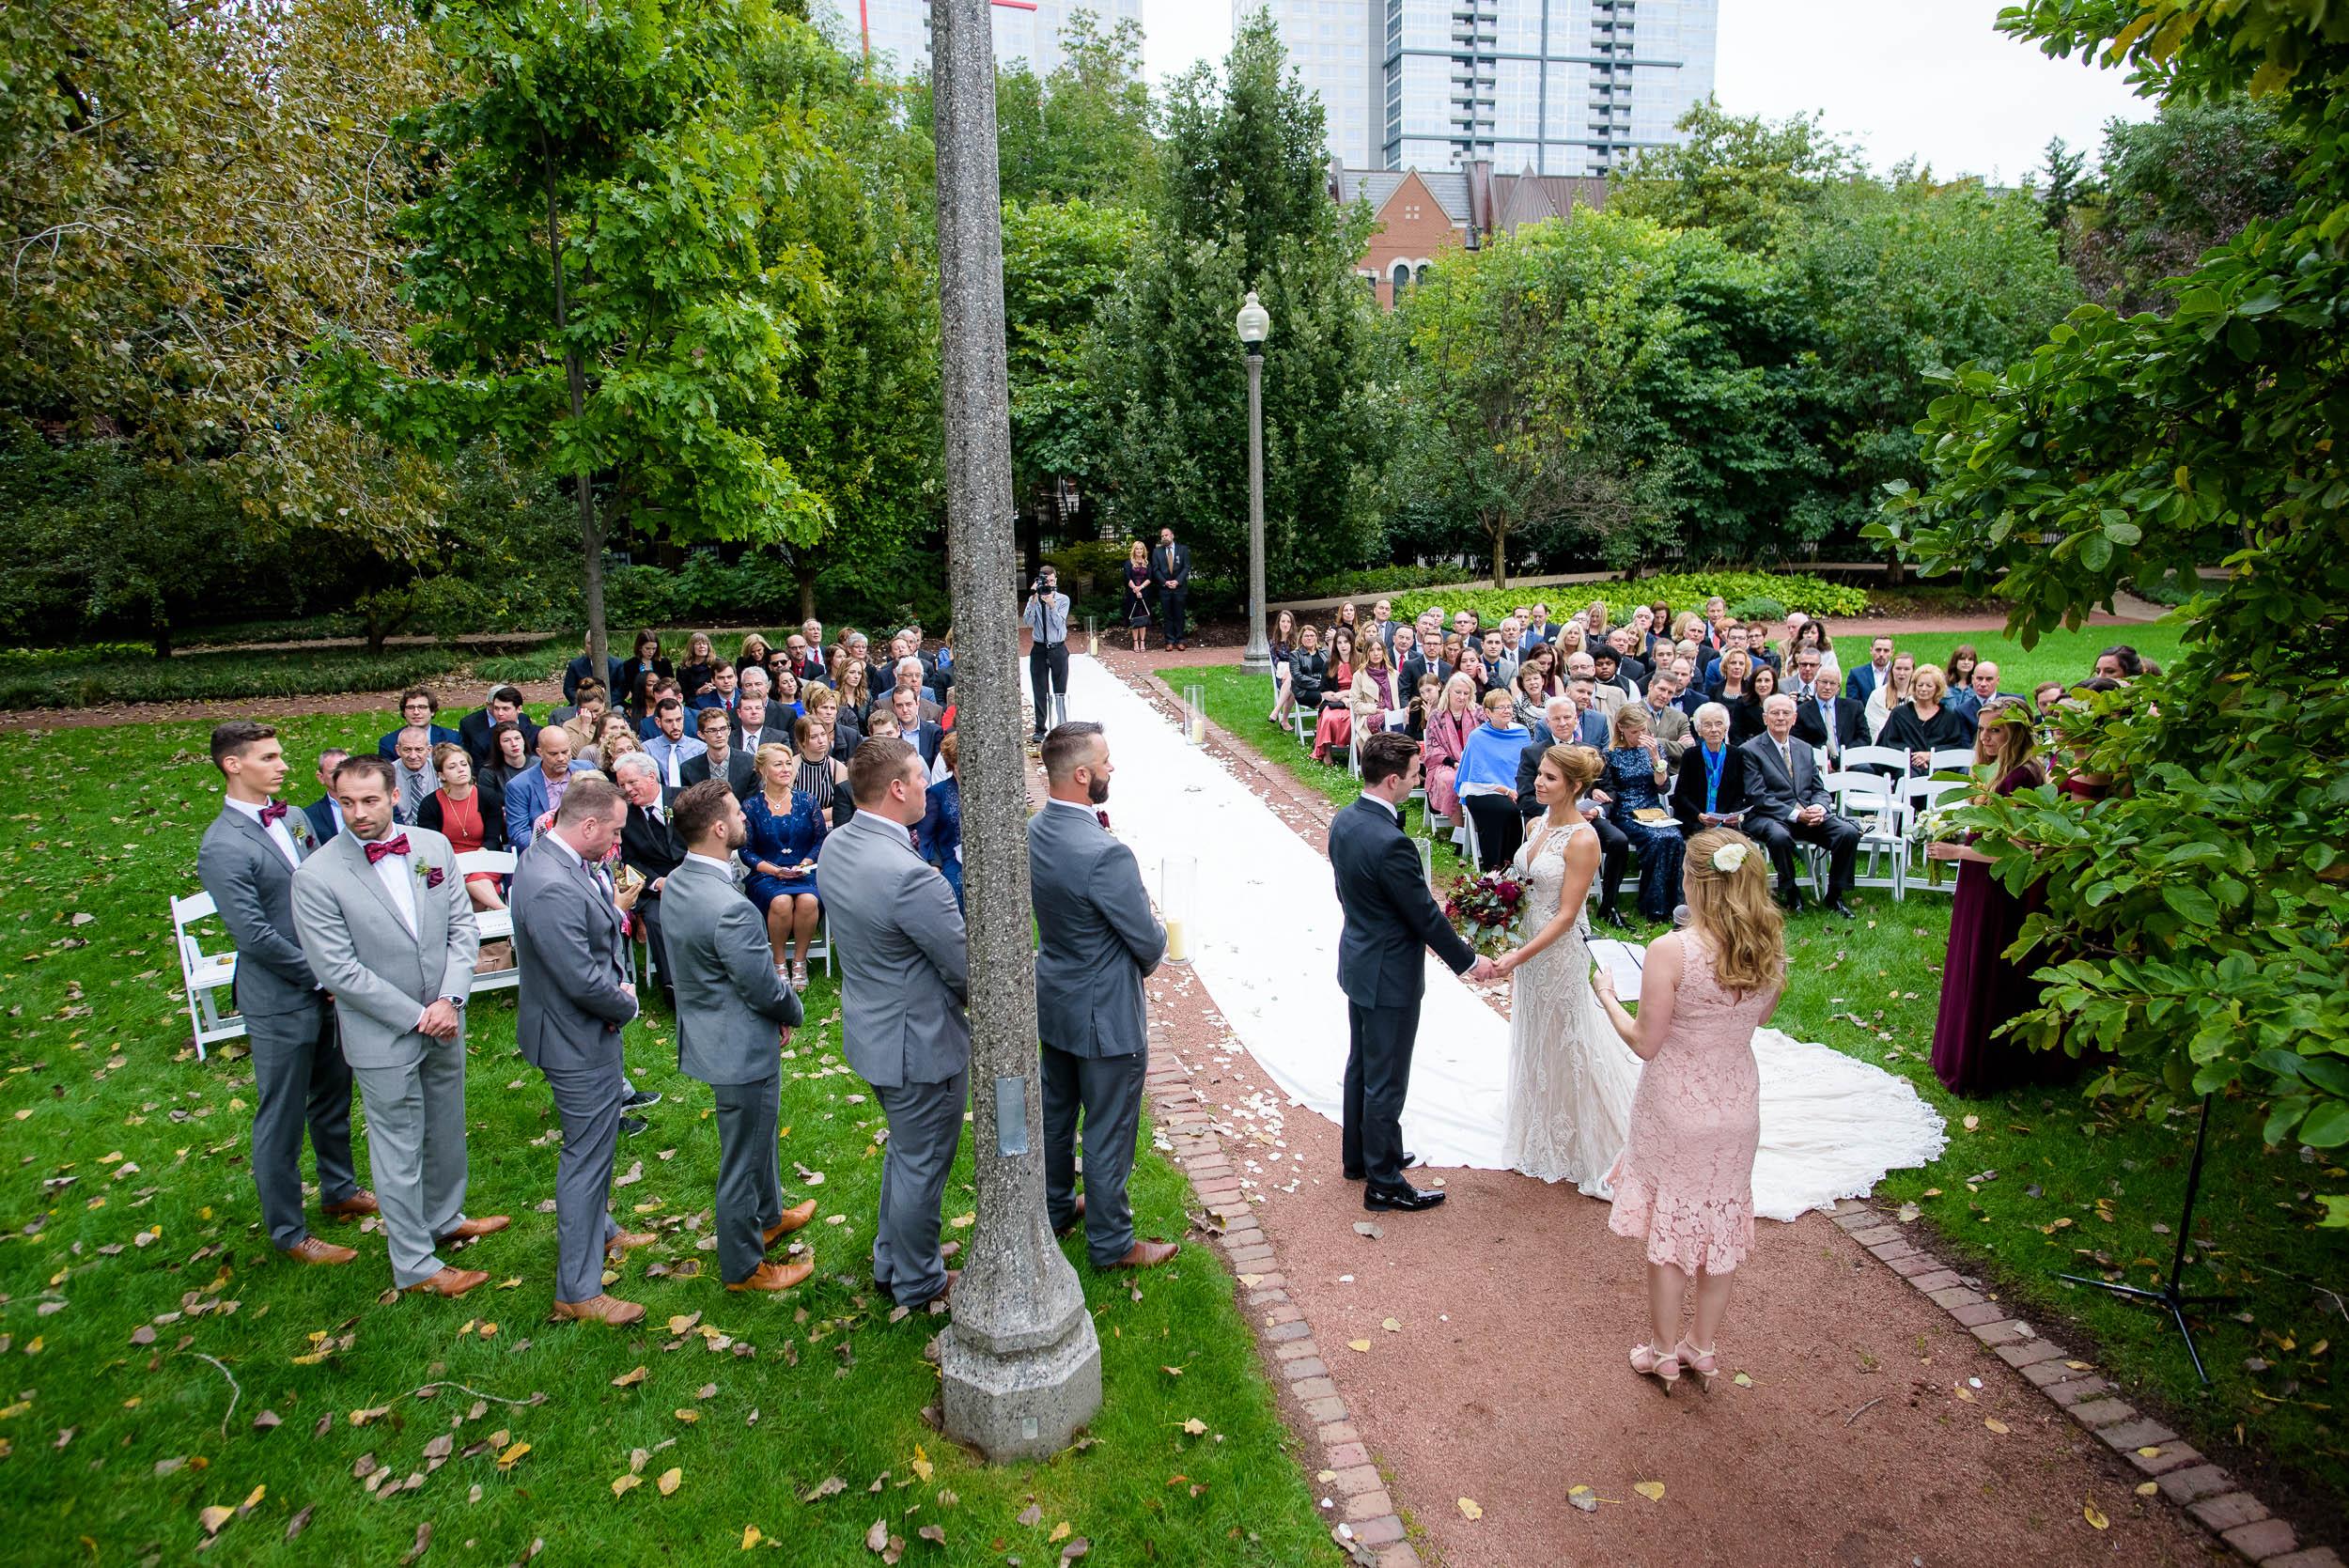 Chicago Women's Park wedding ceremony.